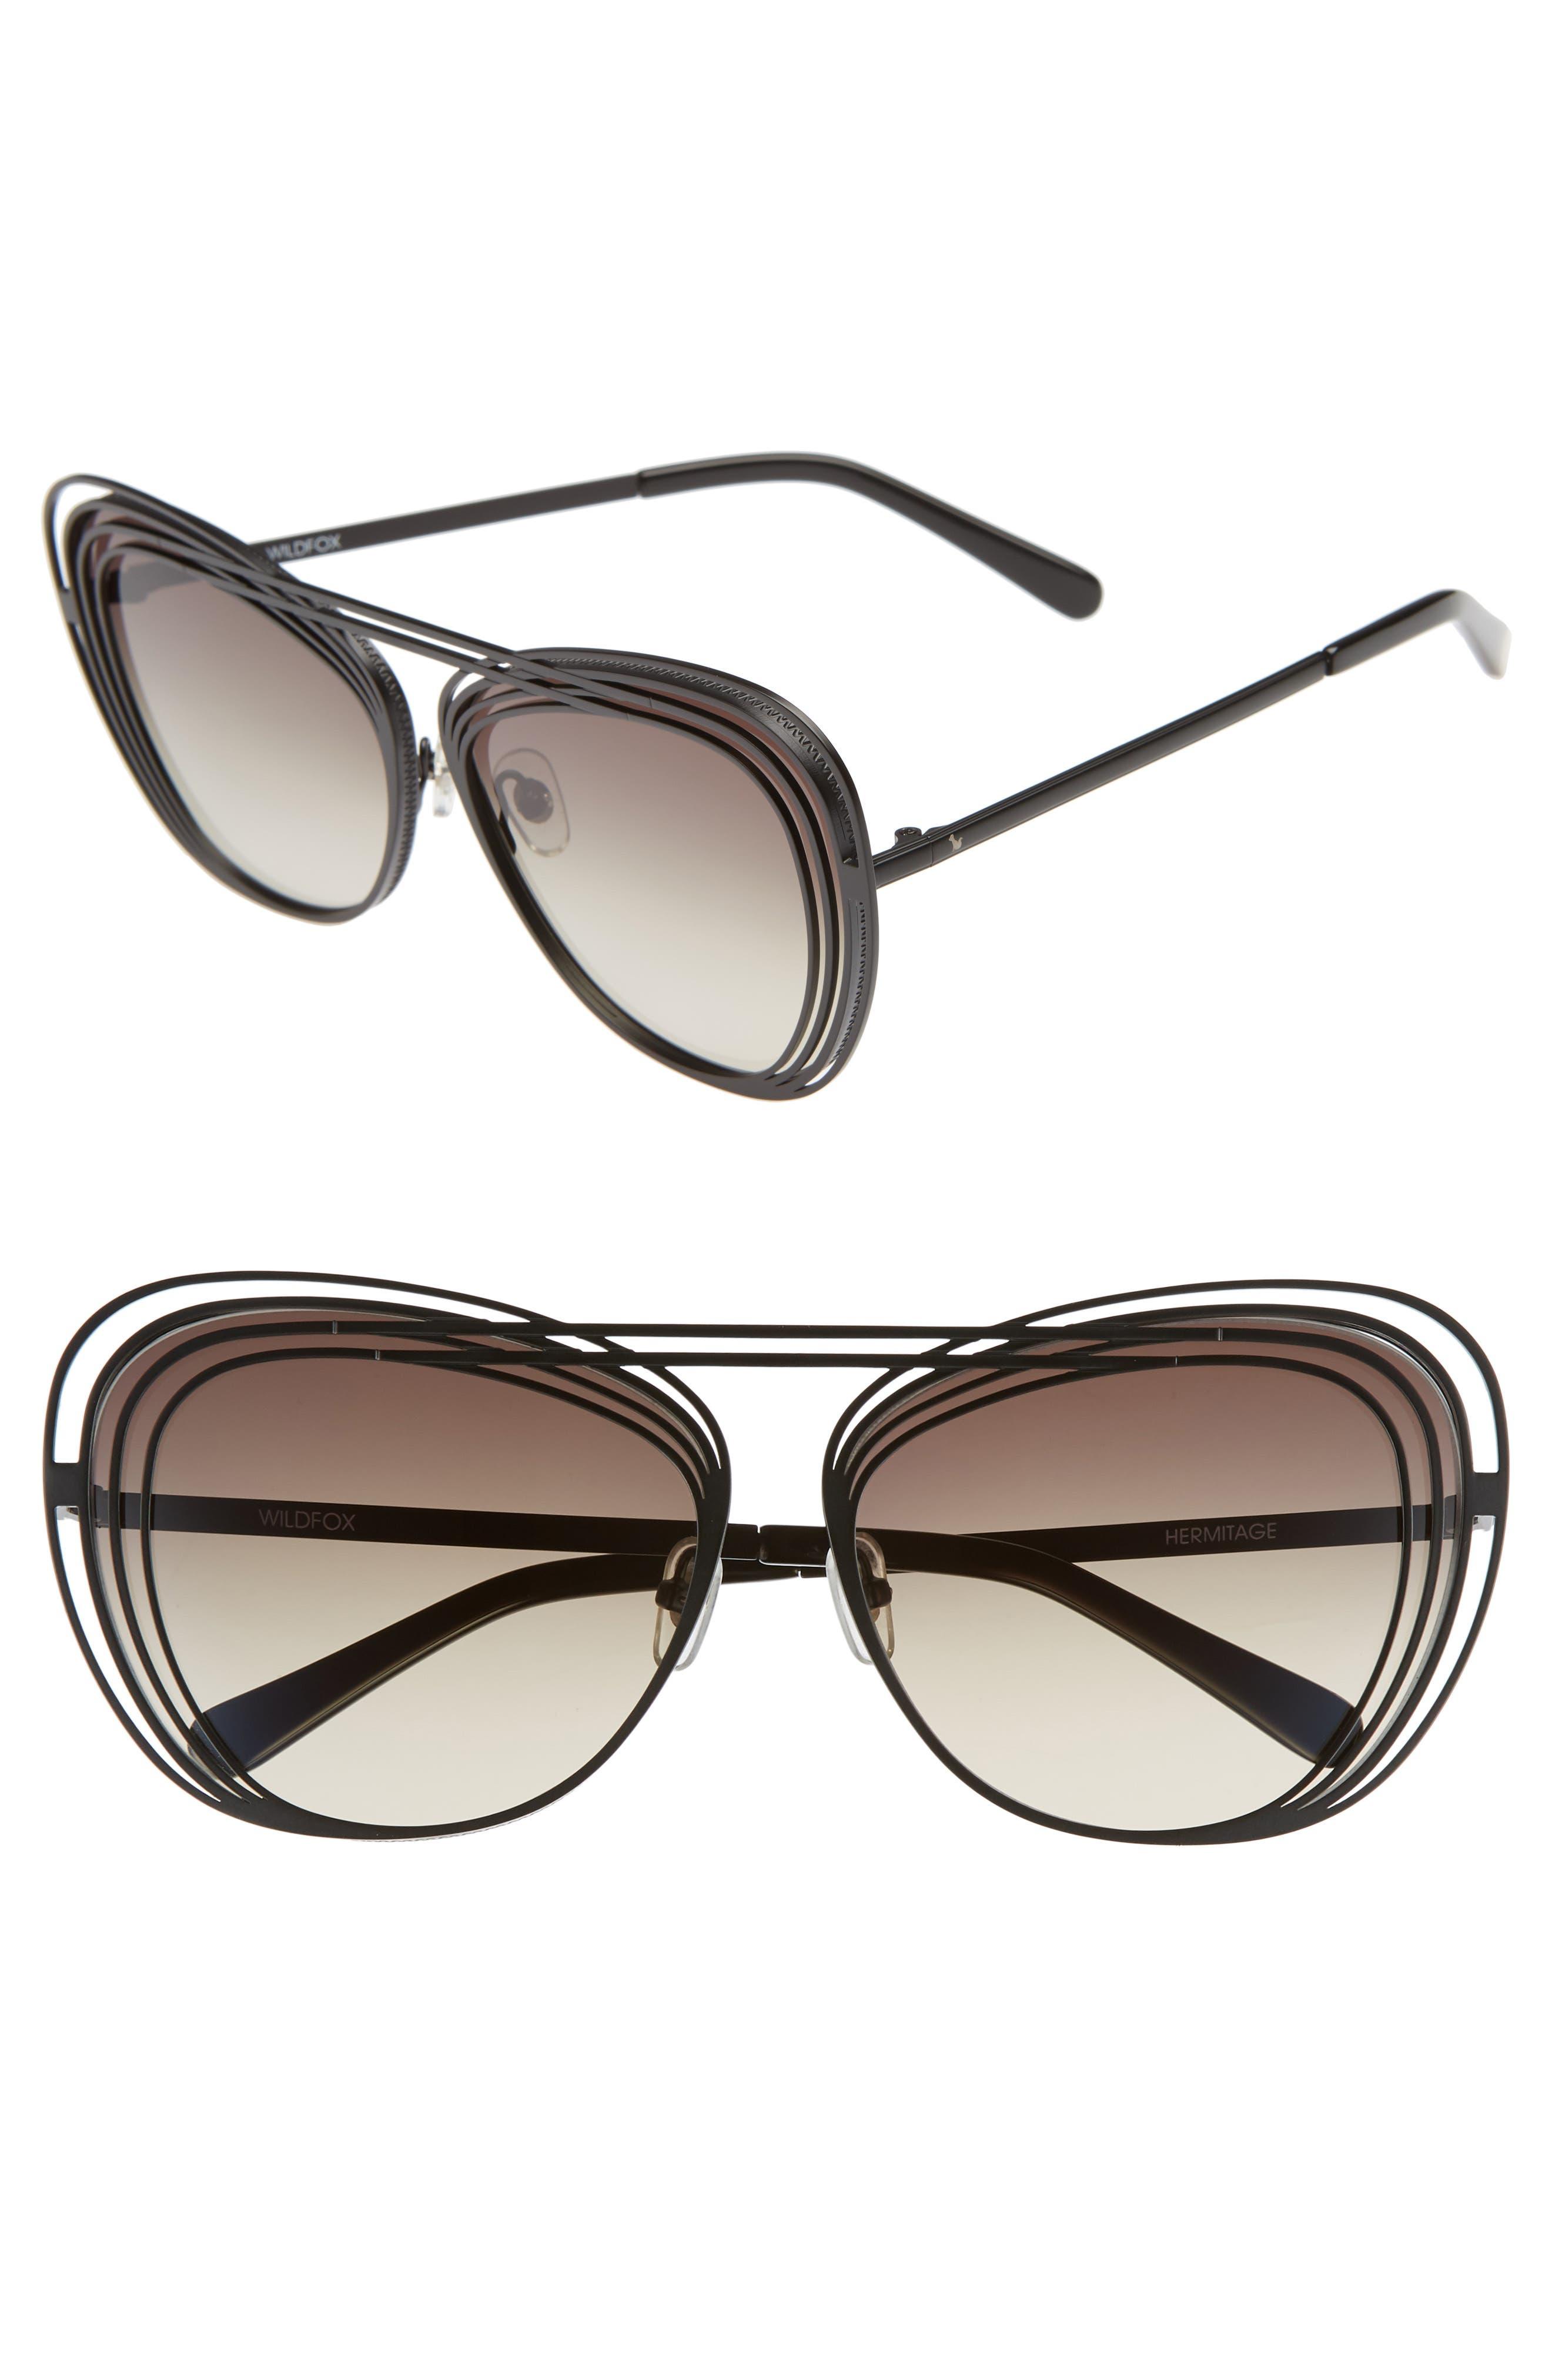 Hermitage 61mm Cat Eye Sunglasses,                             Main thumbnail 1, color,                             MATTE BLACK/ GREY GRADIENT